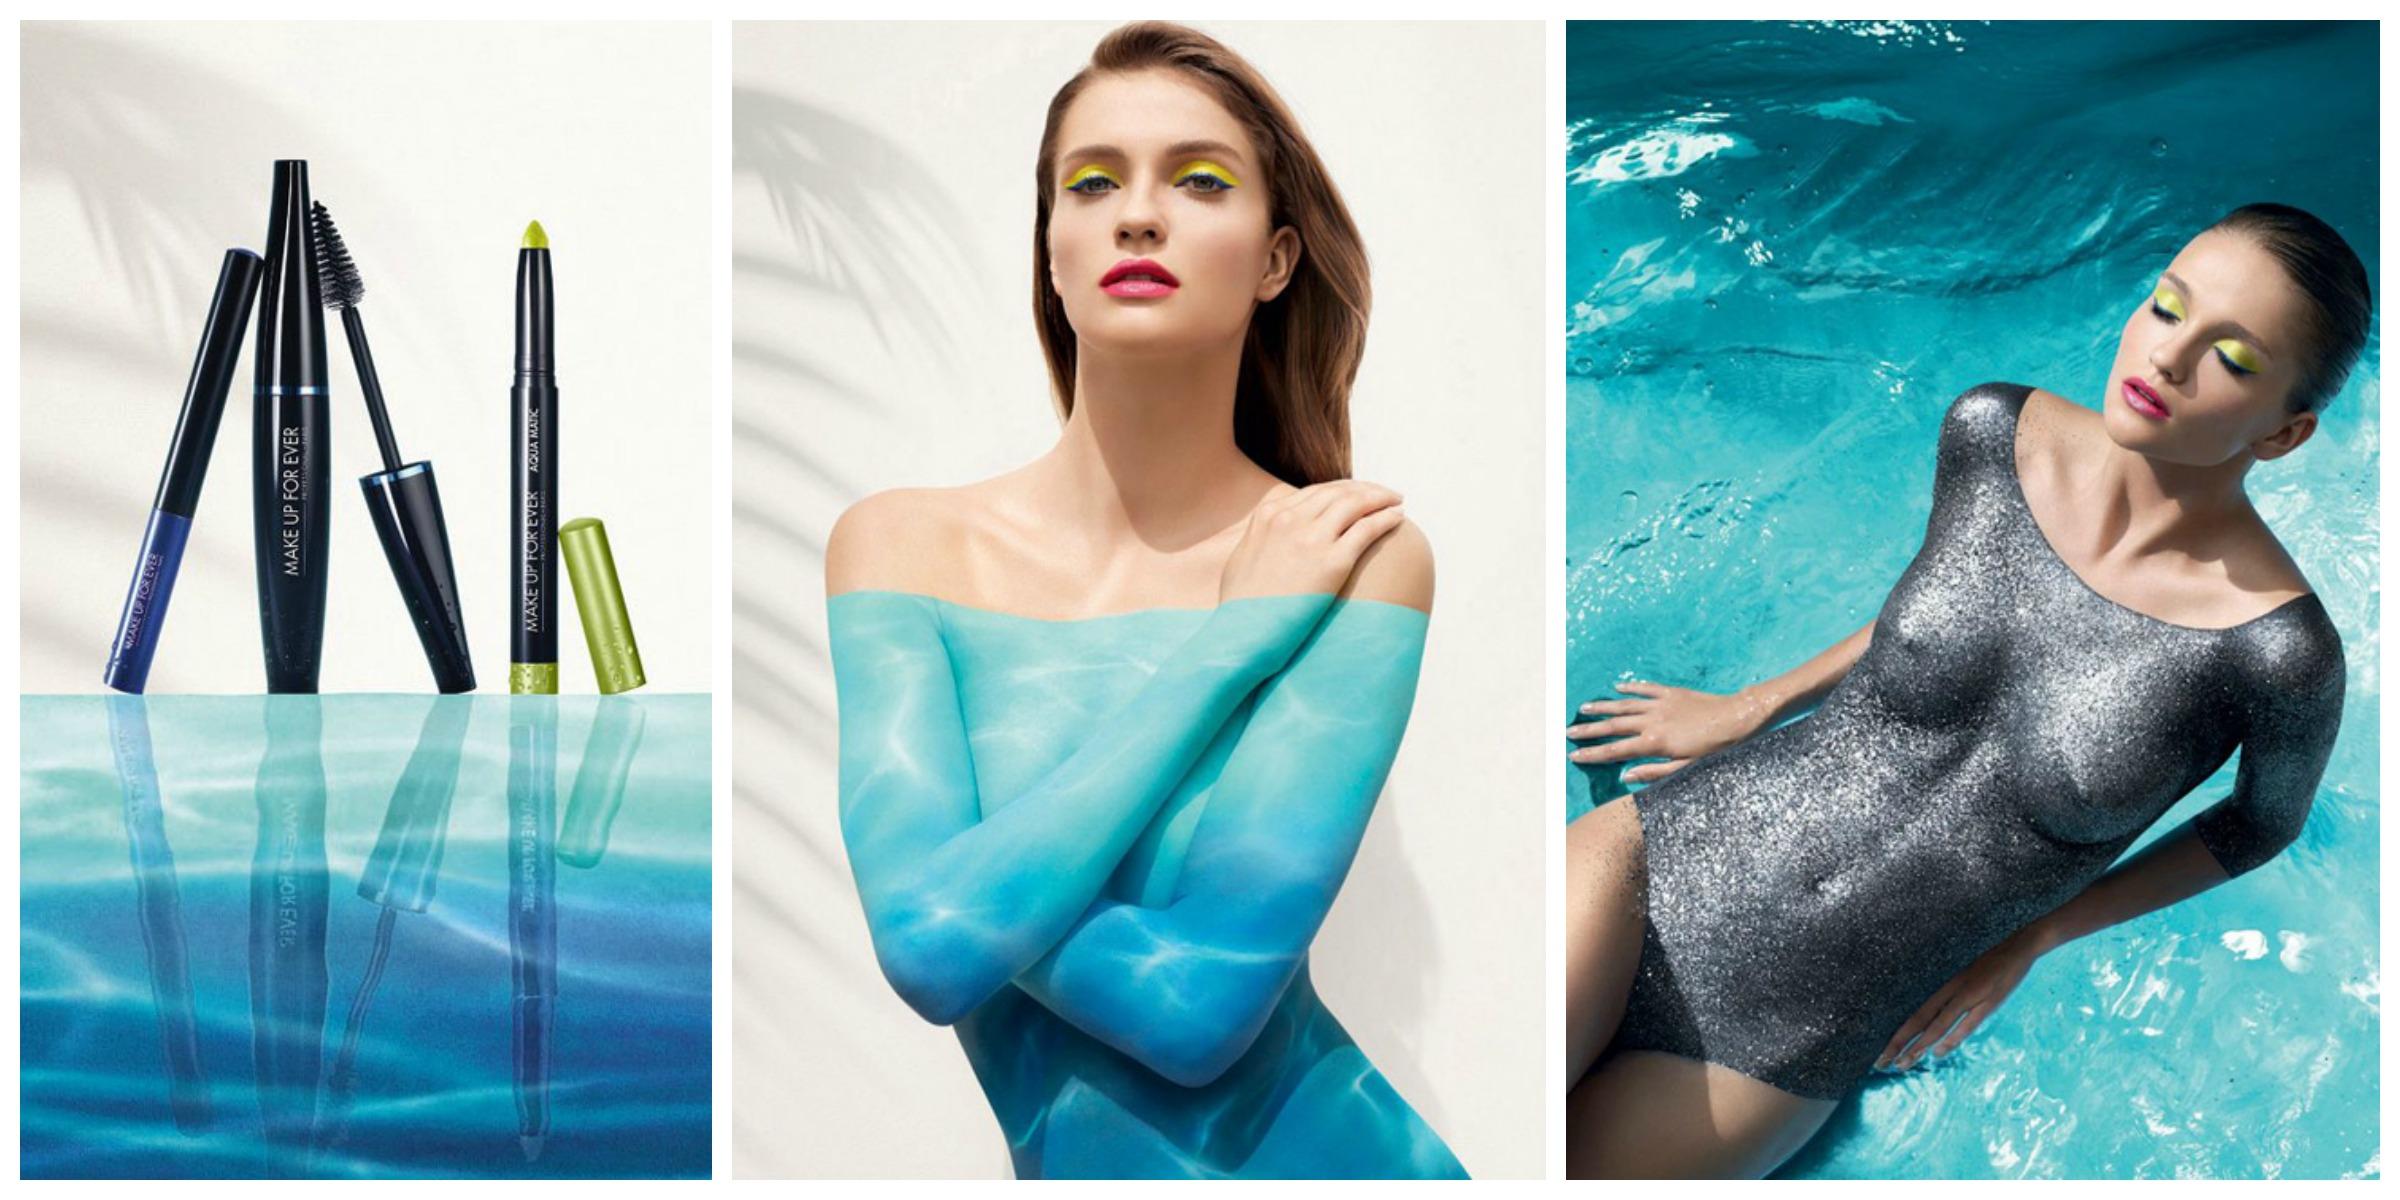 make up for ever aqua matic 2014 Make Up For Ever : la marque de make up la plus arty a 30 ans